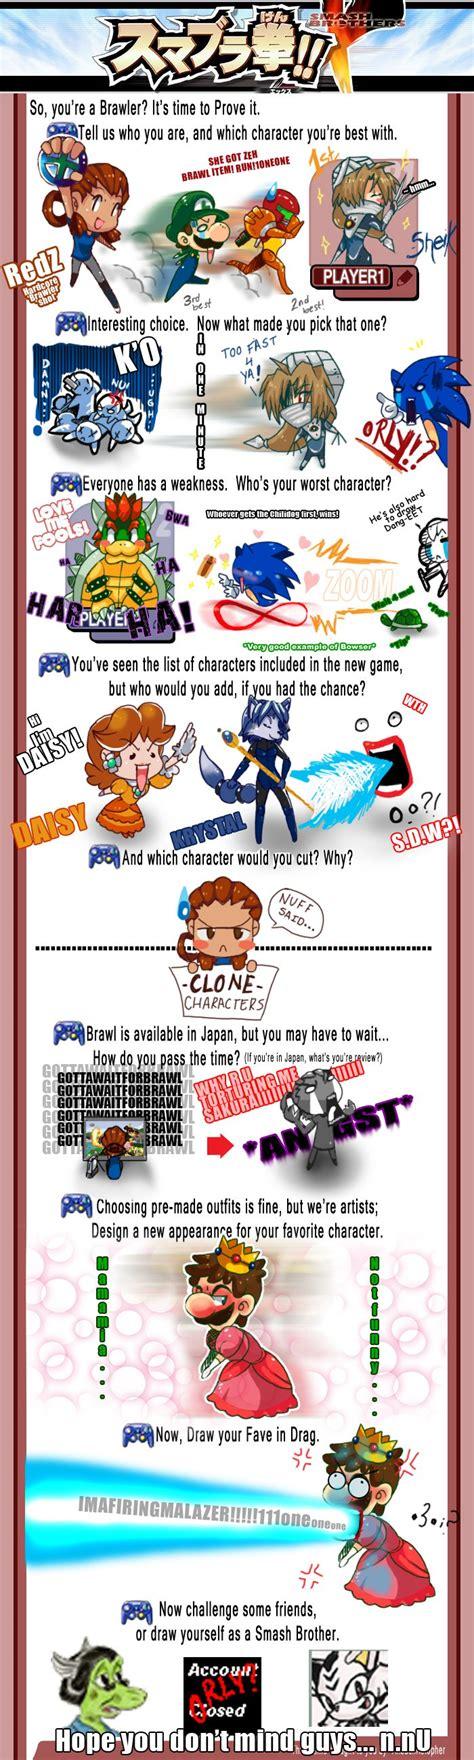 Smash Bros Memes - super smash bros melee memes www imgkid com the image kid has it